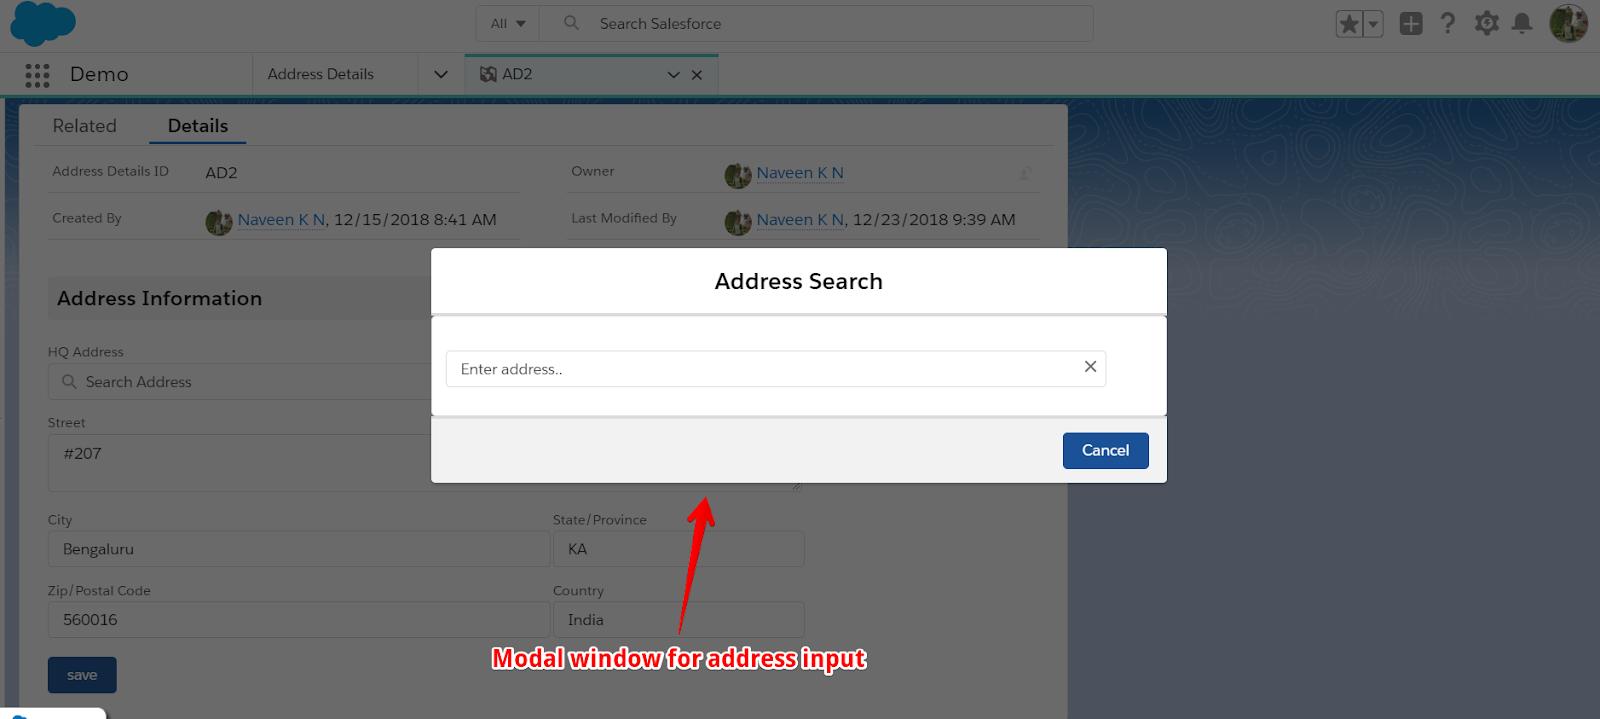 Salesforce and google api integration for address autocomplete